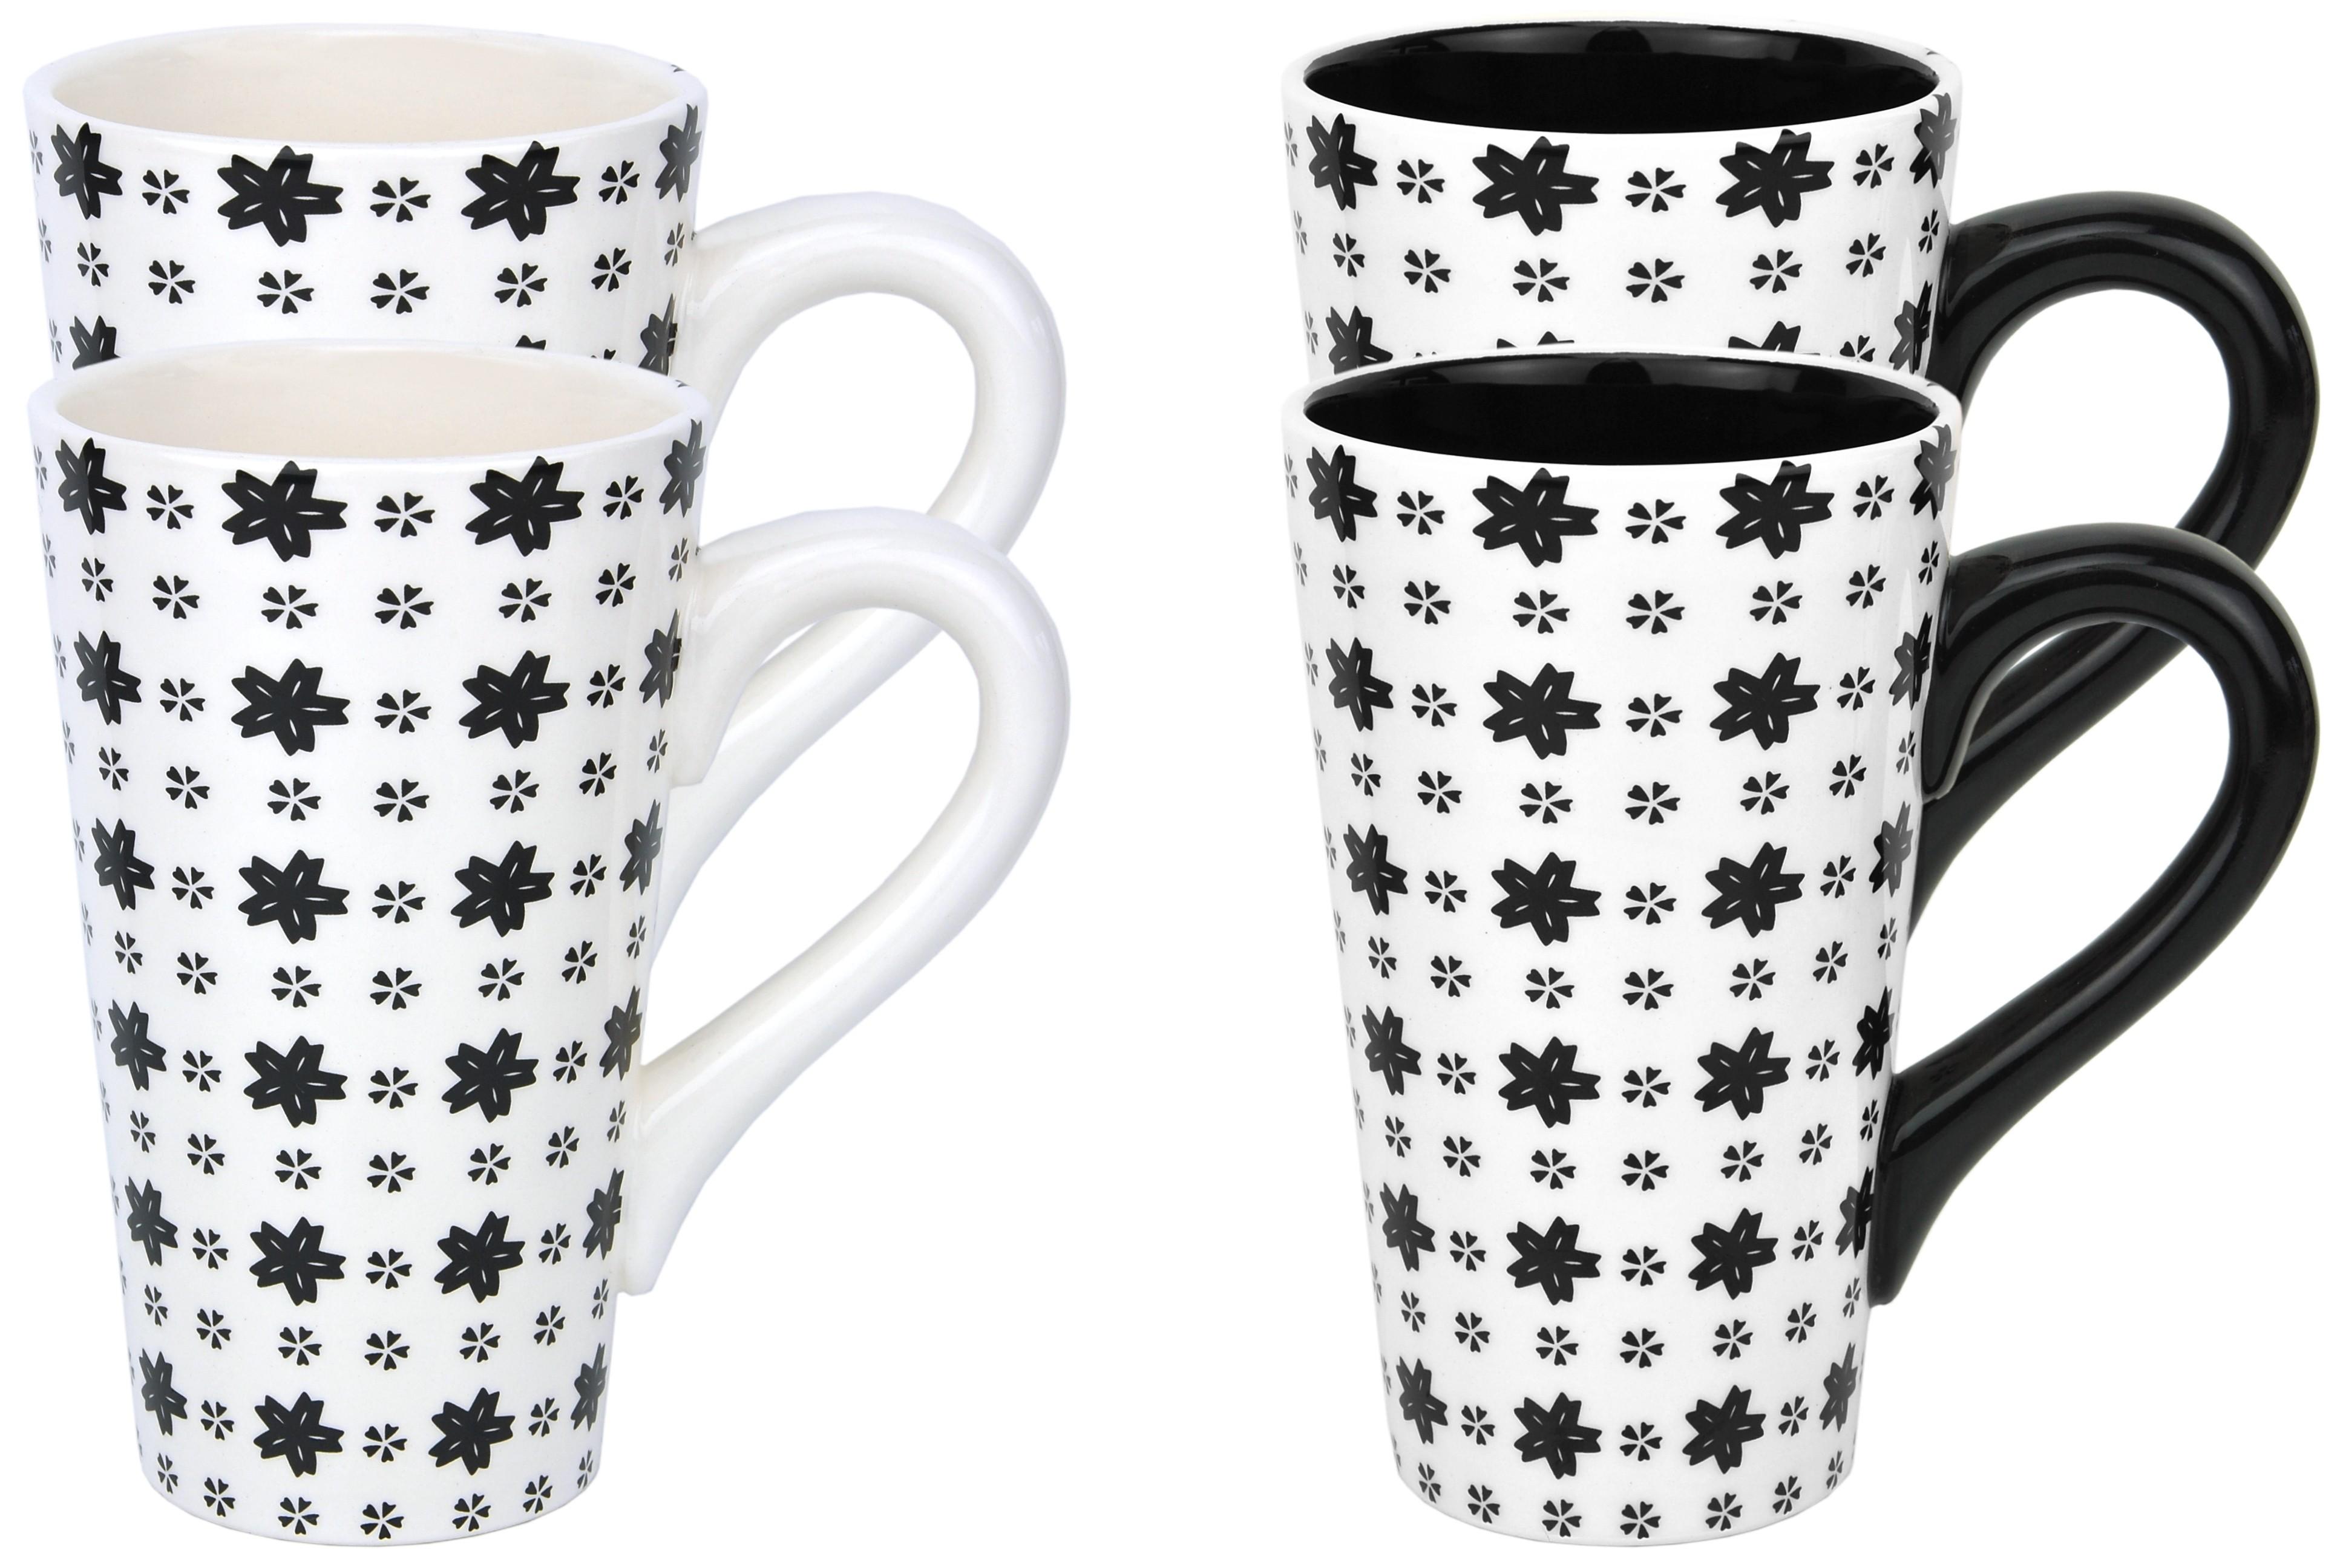 4 tee becher tassen keramik sterne mosaik schwarz wei jameson tailor teeprobe ebay. Black Bedroom Furniture Sets. Home Design Ideas